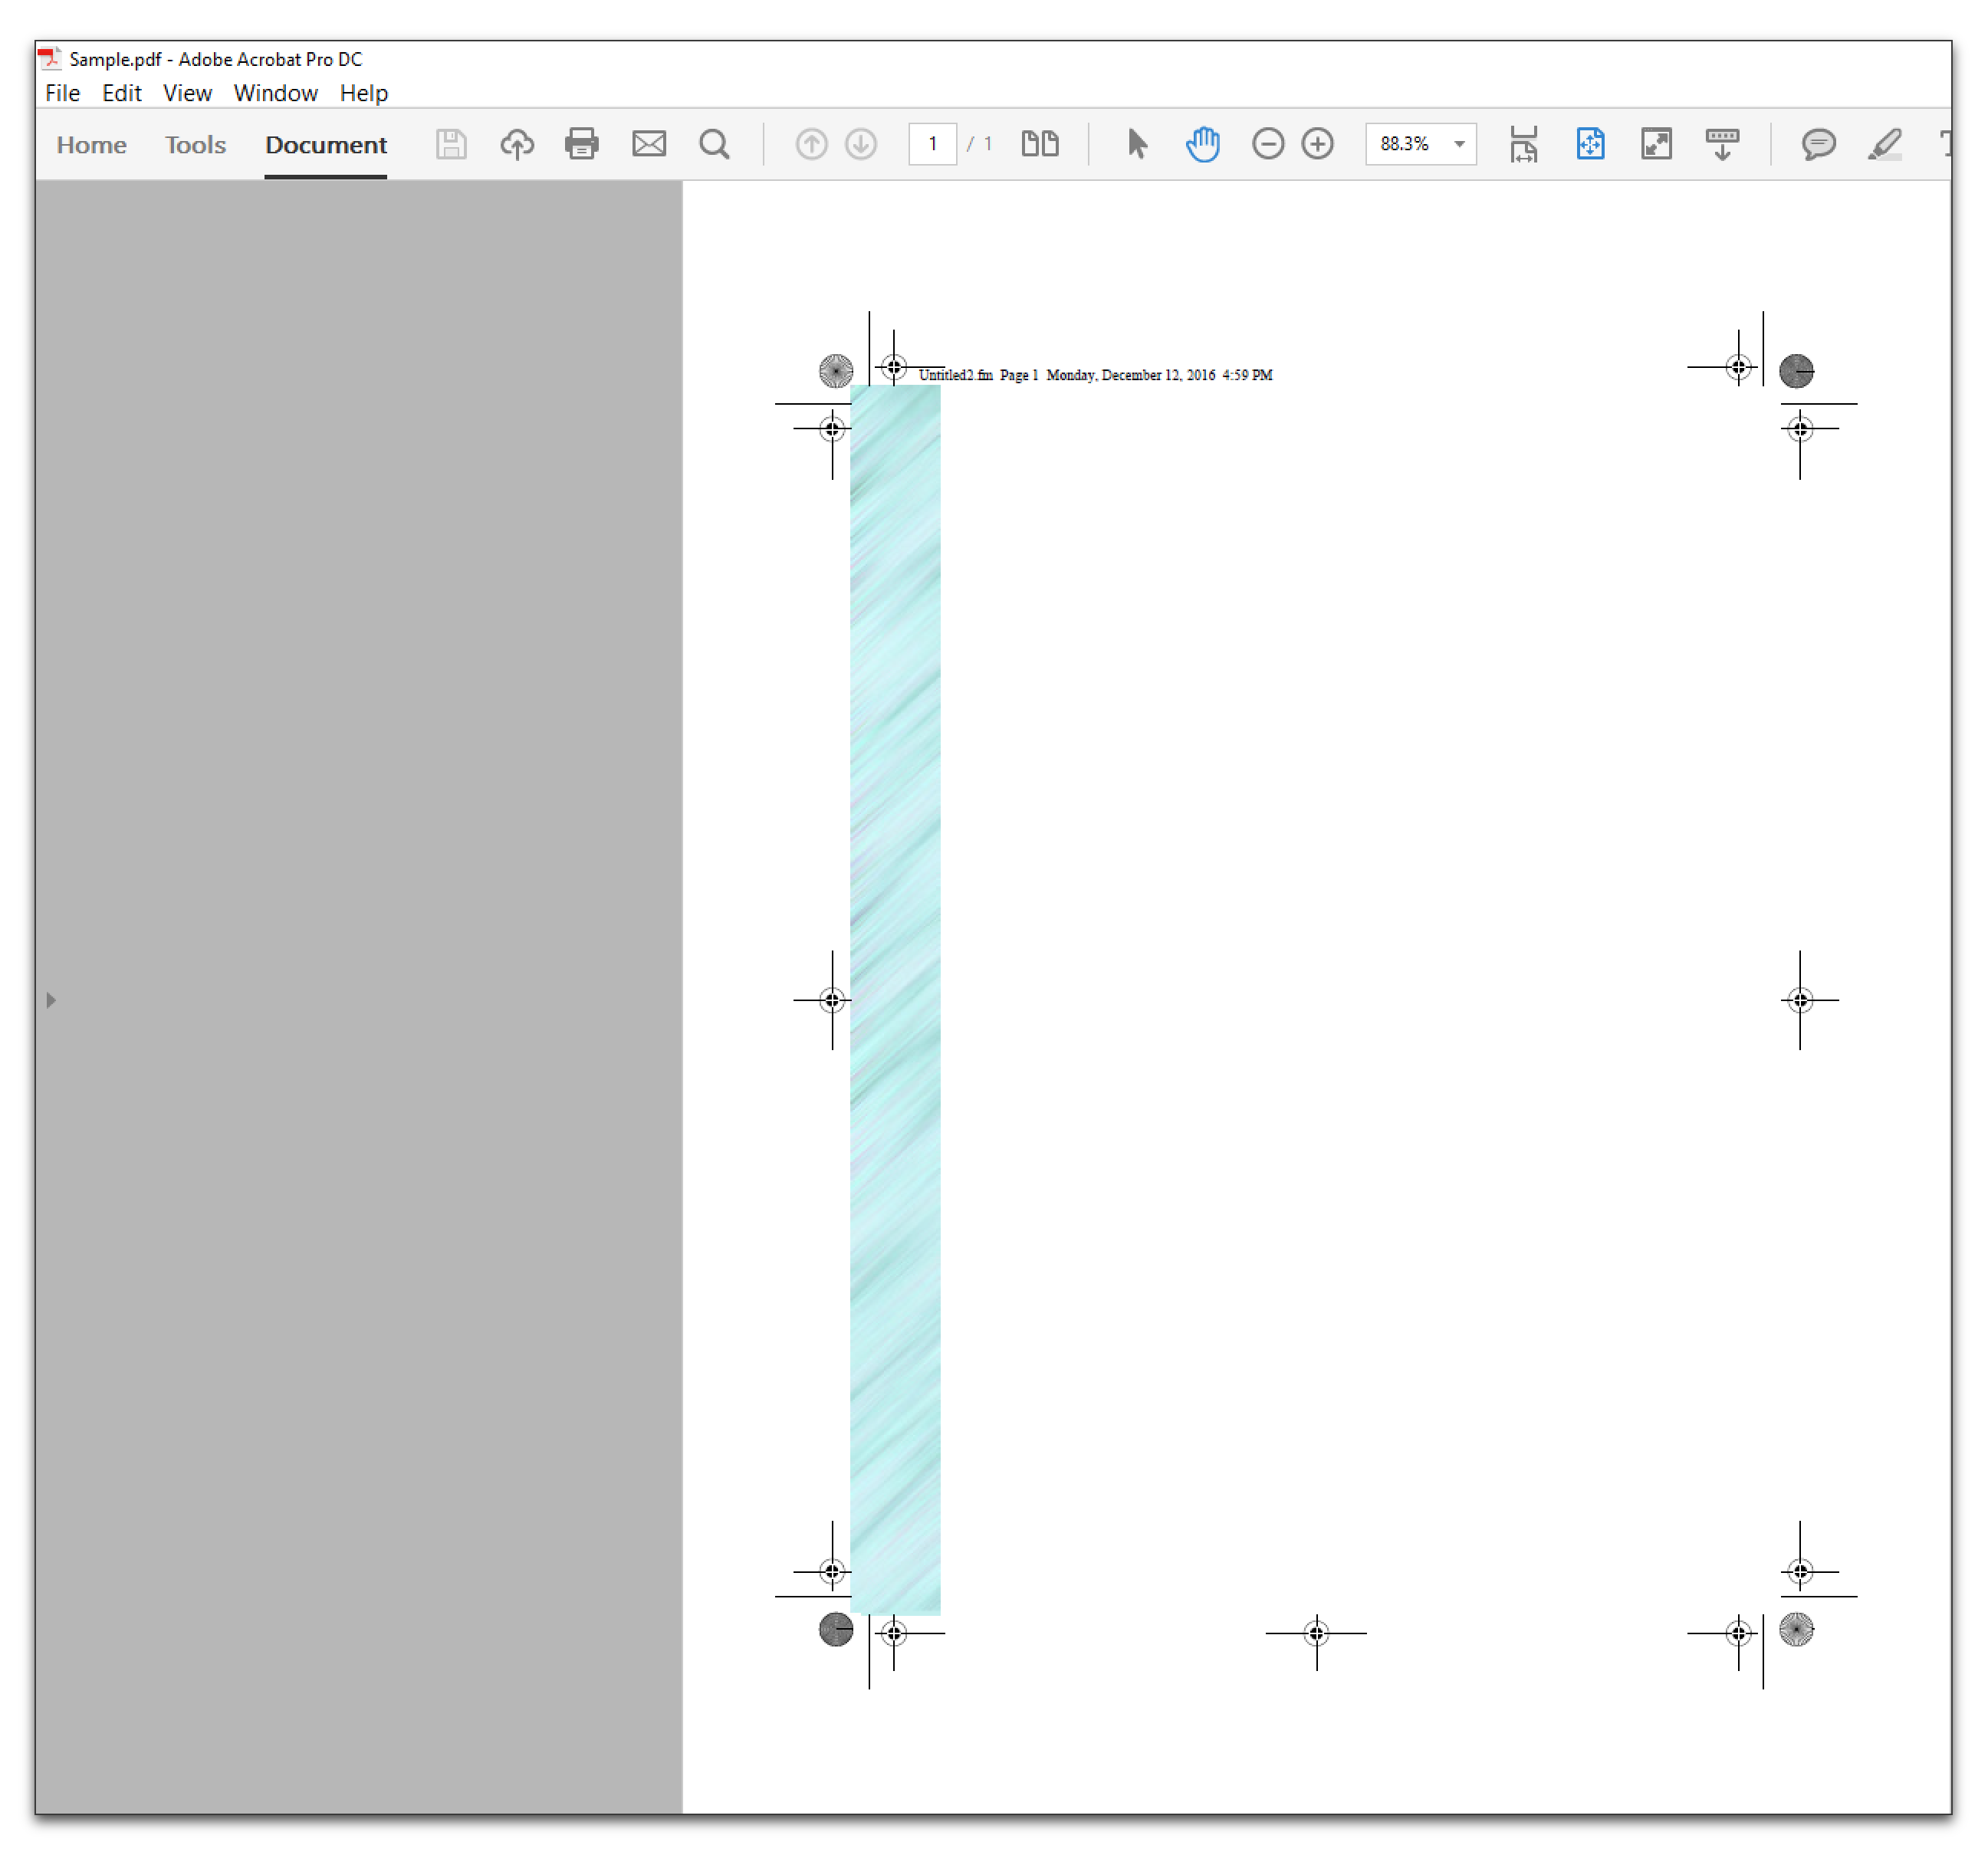 Adobe FrameMaker: Adding Bleeds and Trim Lines - Rocky Mountain Training